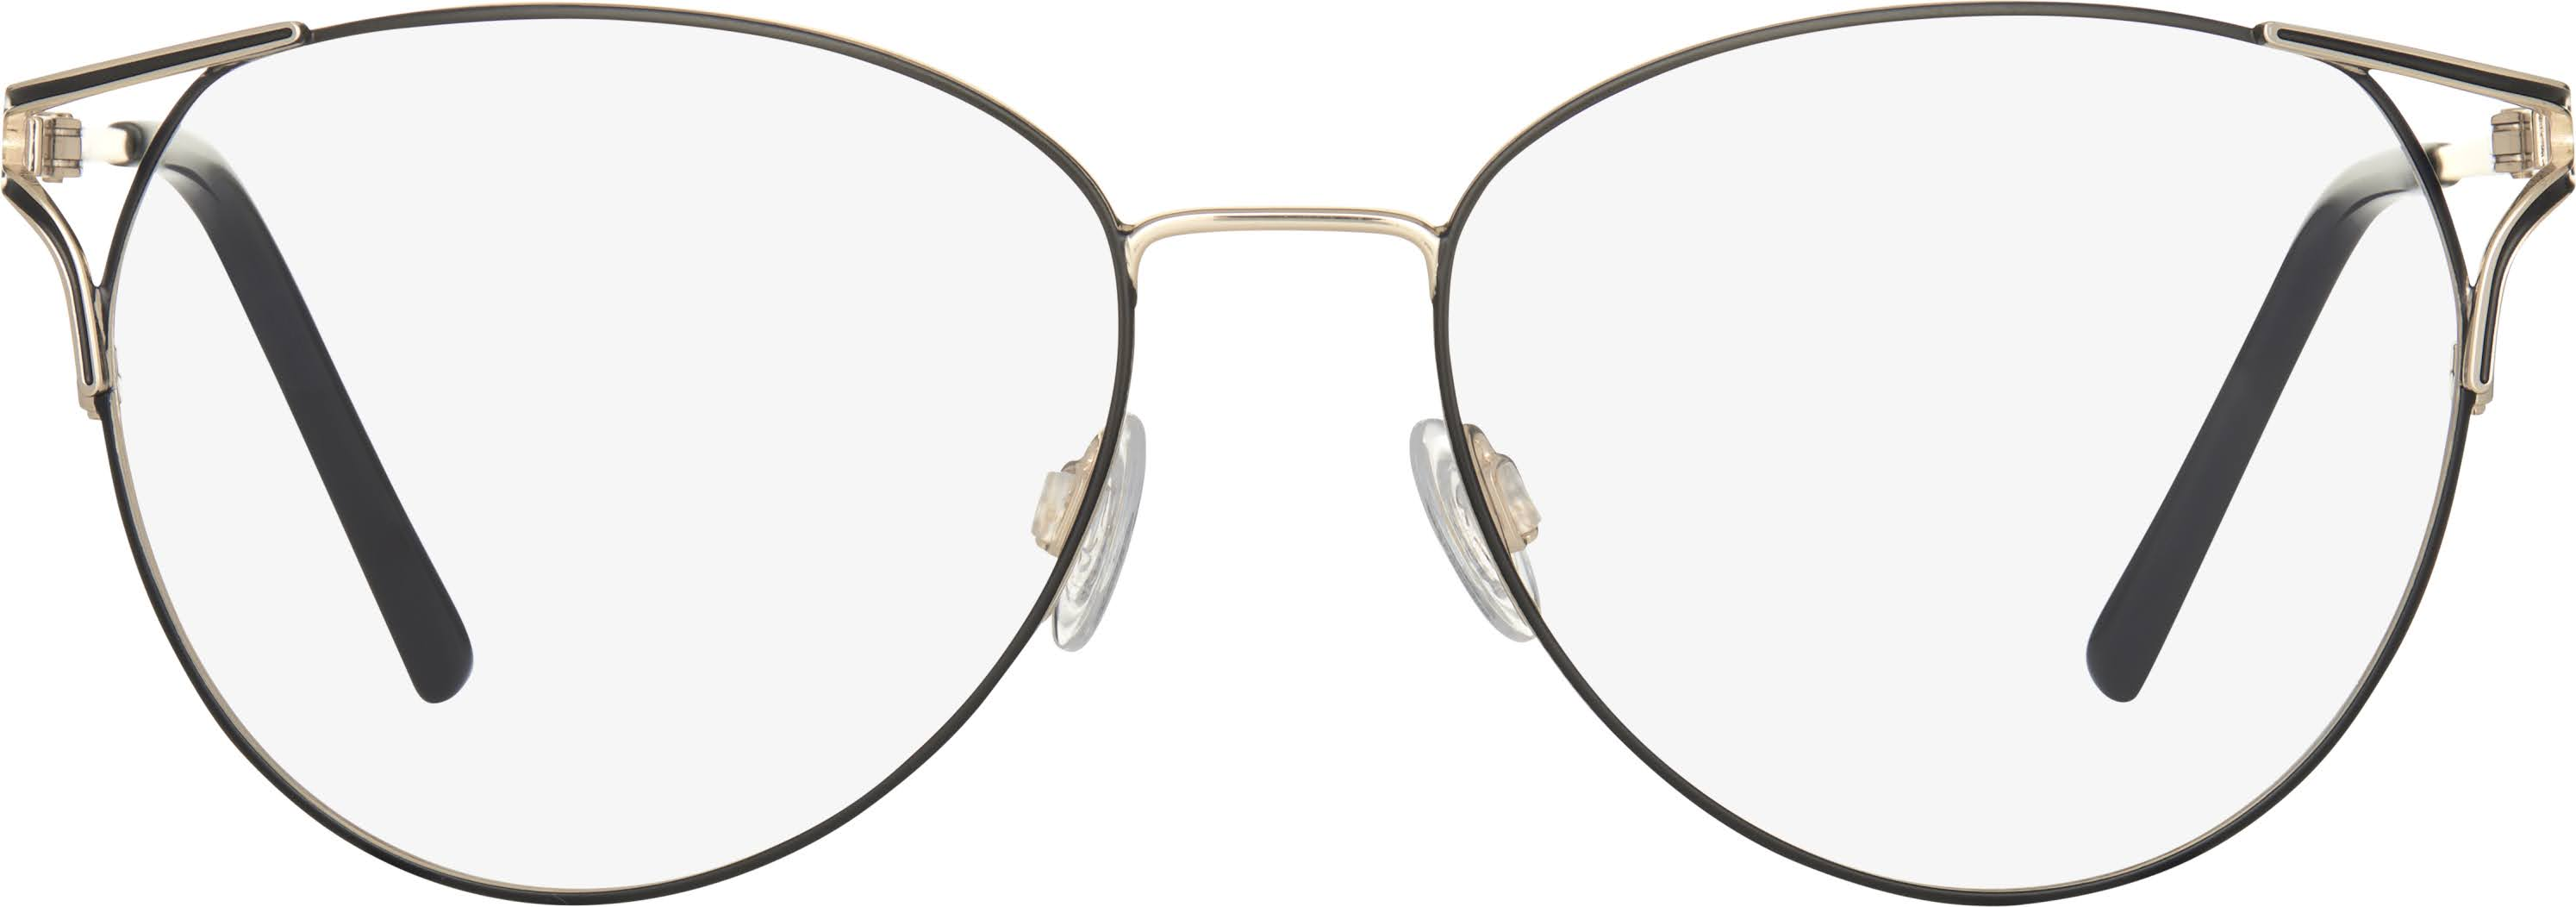 Mubadala to invest in premium ophthalmic lens innovator Rodenstock